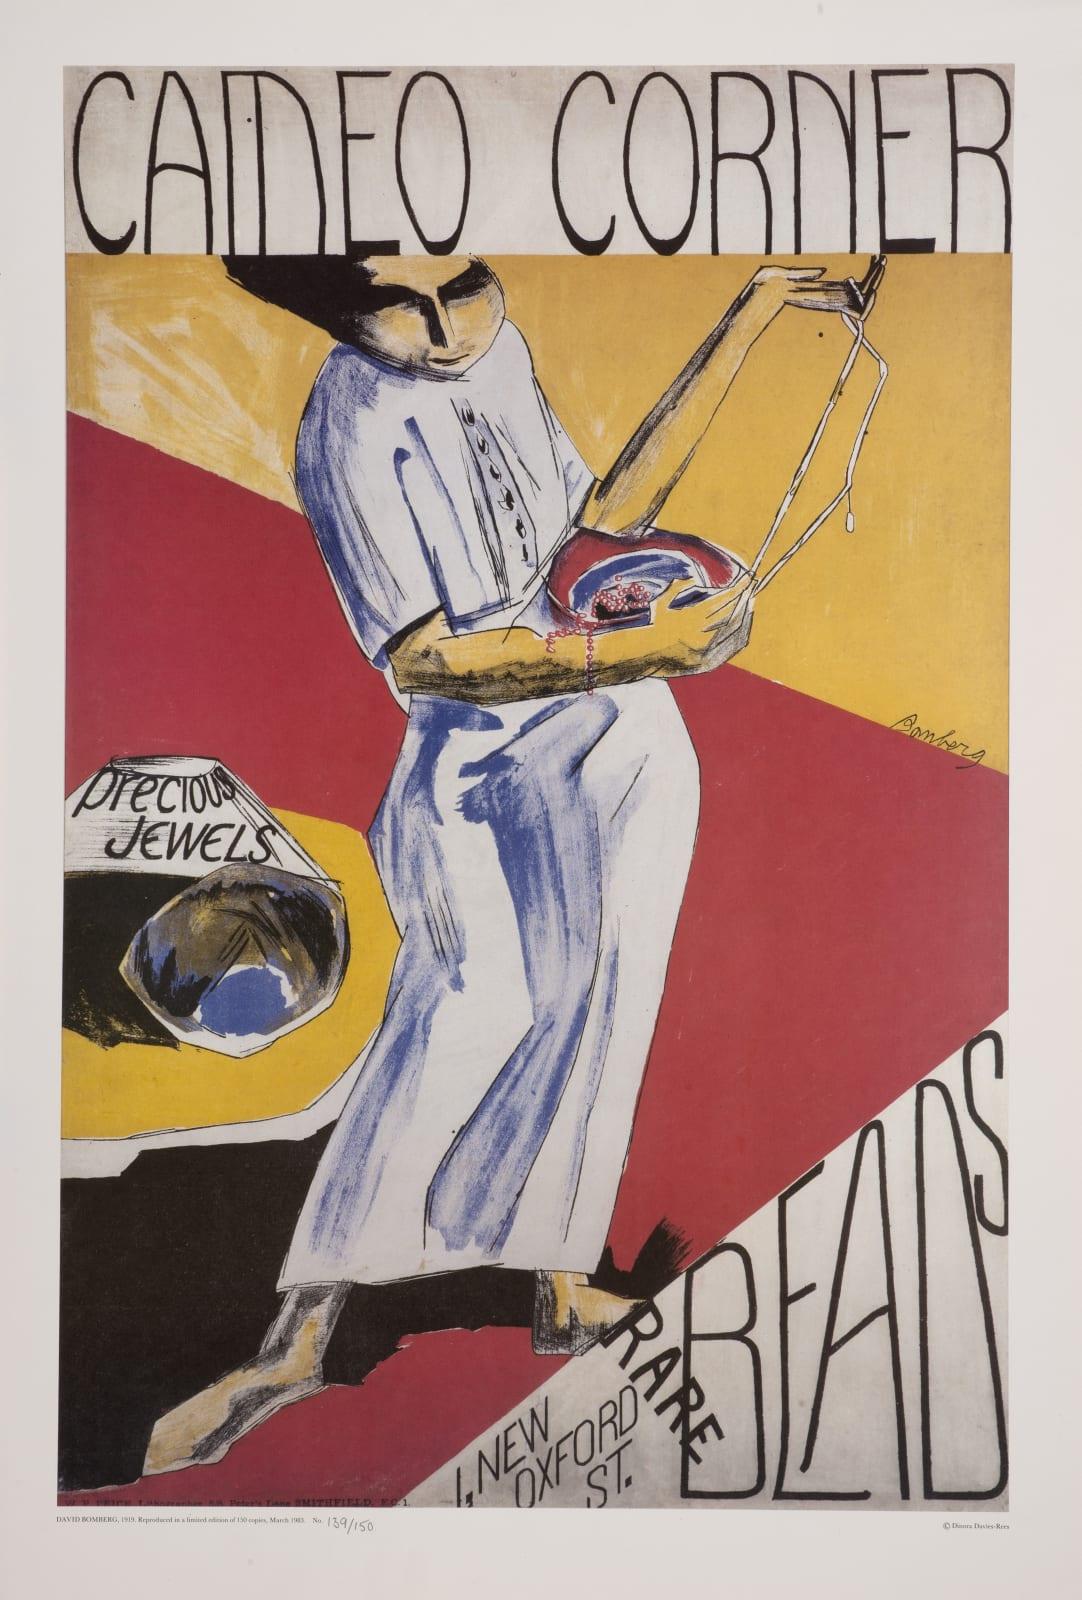 David Bomberg (1890-1957) Cameo Corner 1919 (reprinted 1983) Lithographic poster 83 x 55.5 cm Ben Uri Collection © David Bomberg estate